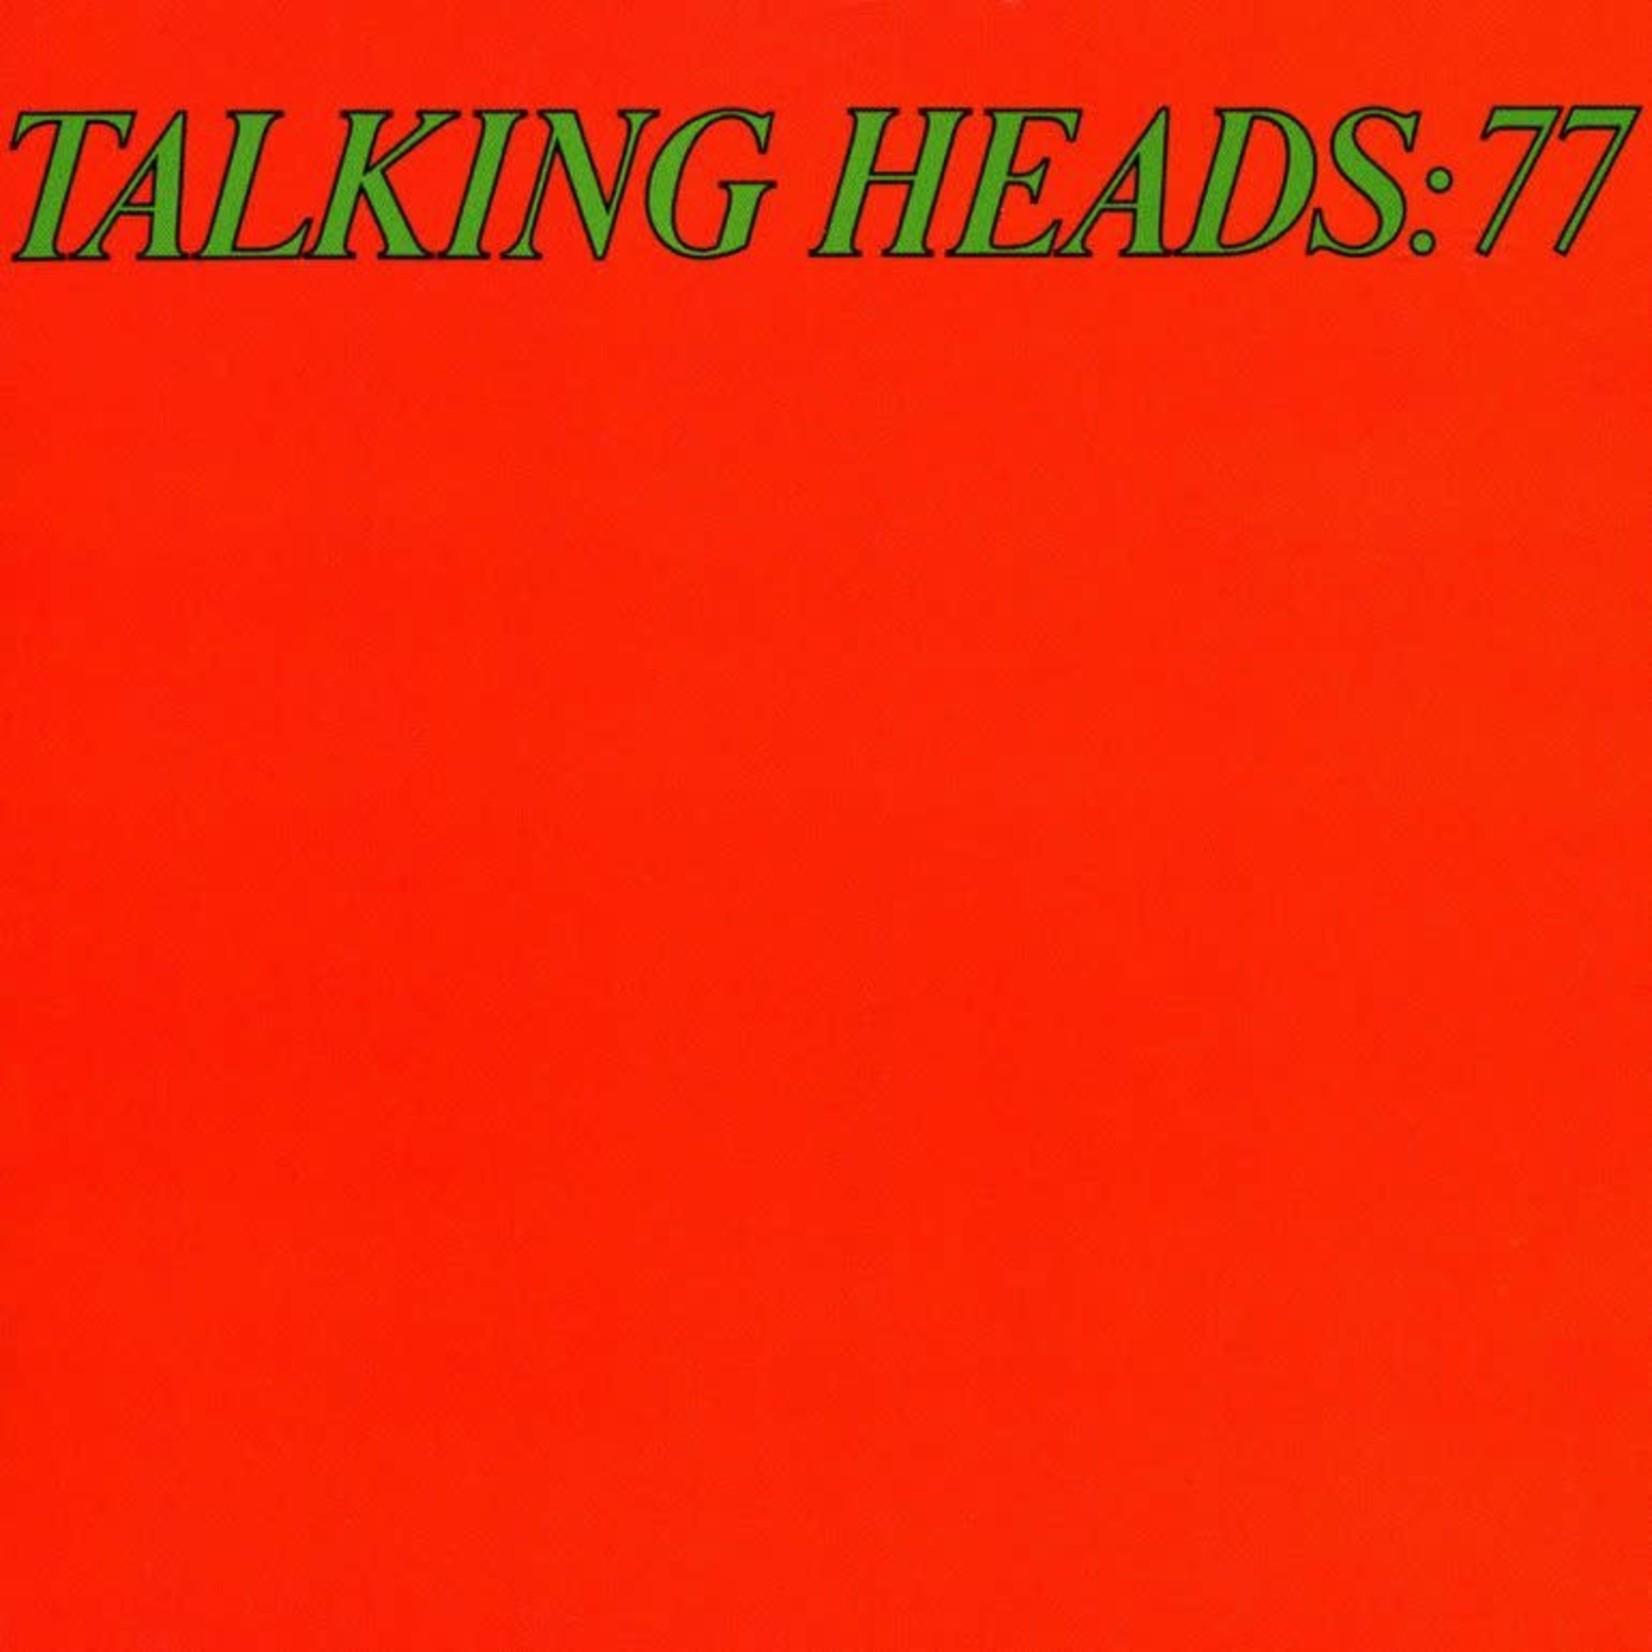 Vinyl Talking Heads - 77 (Green Vinyl)